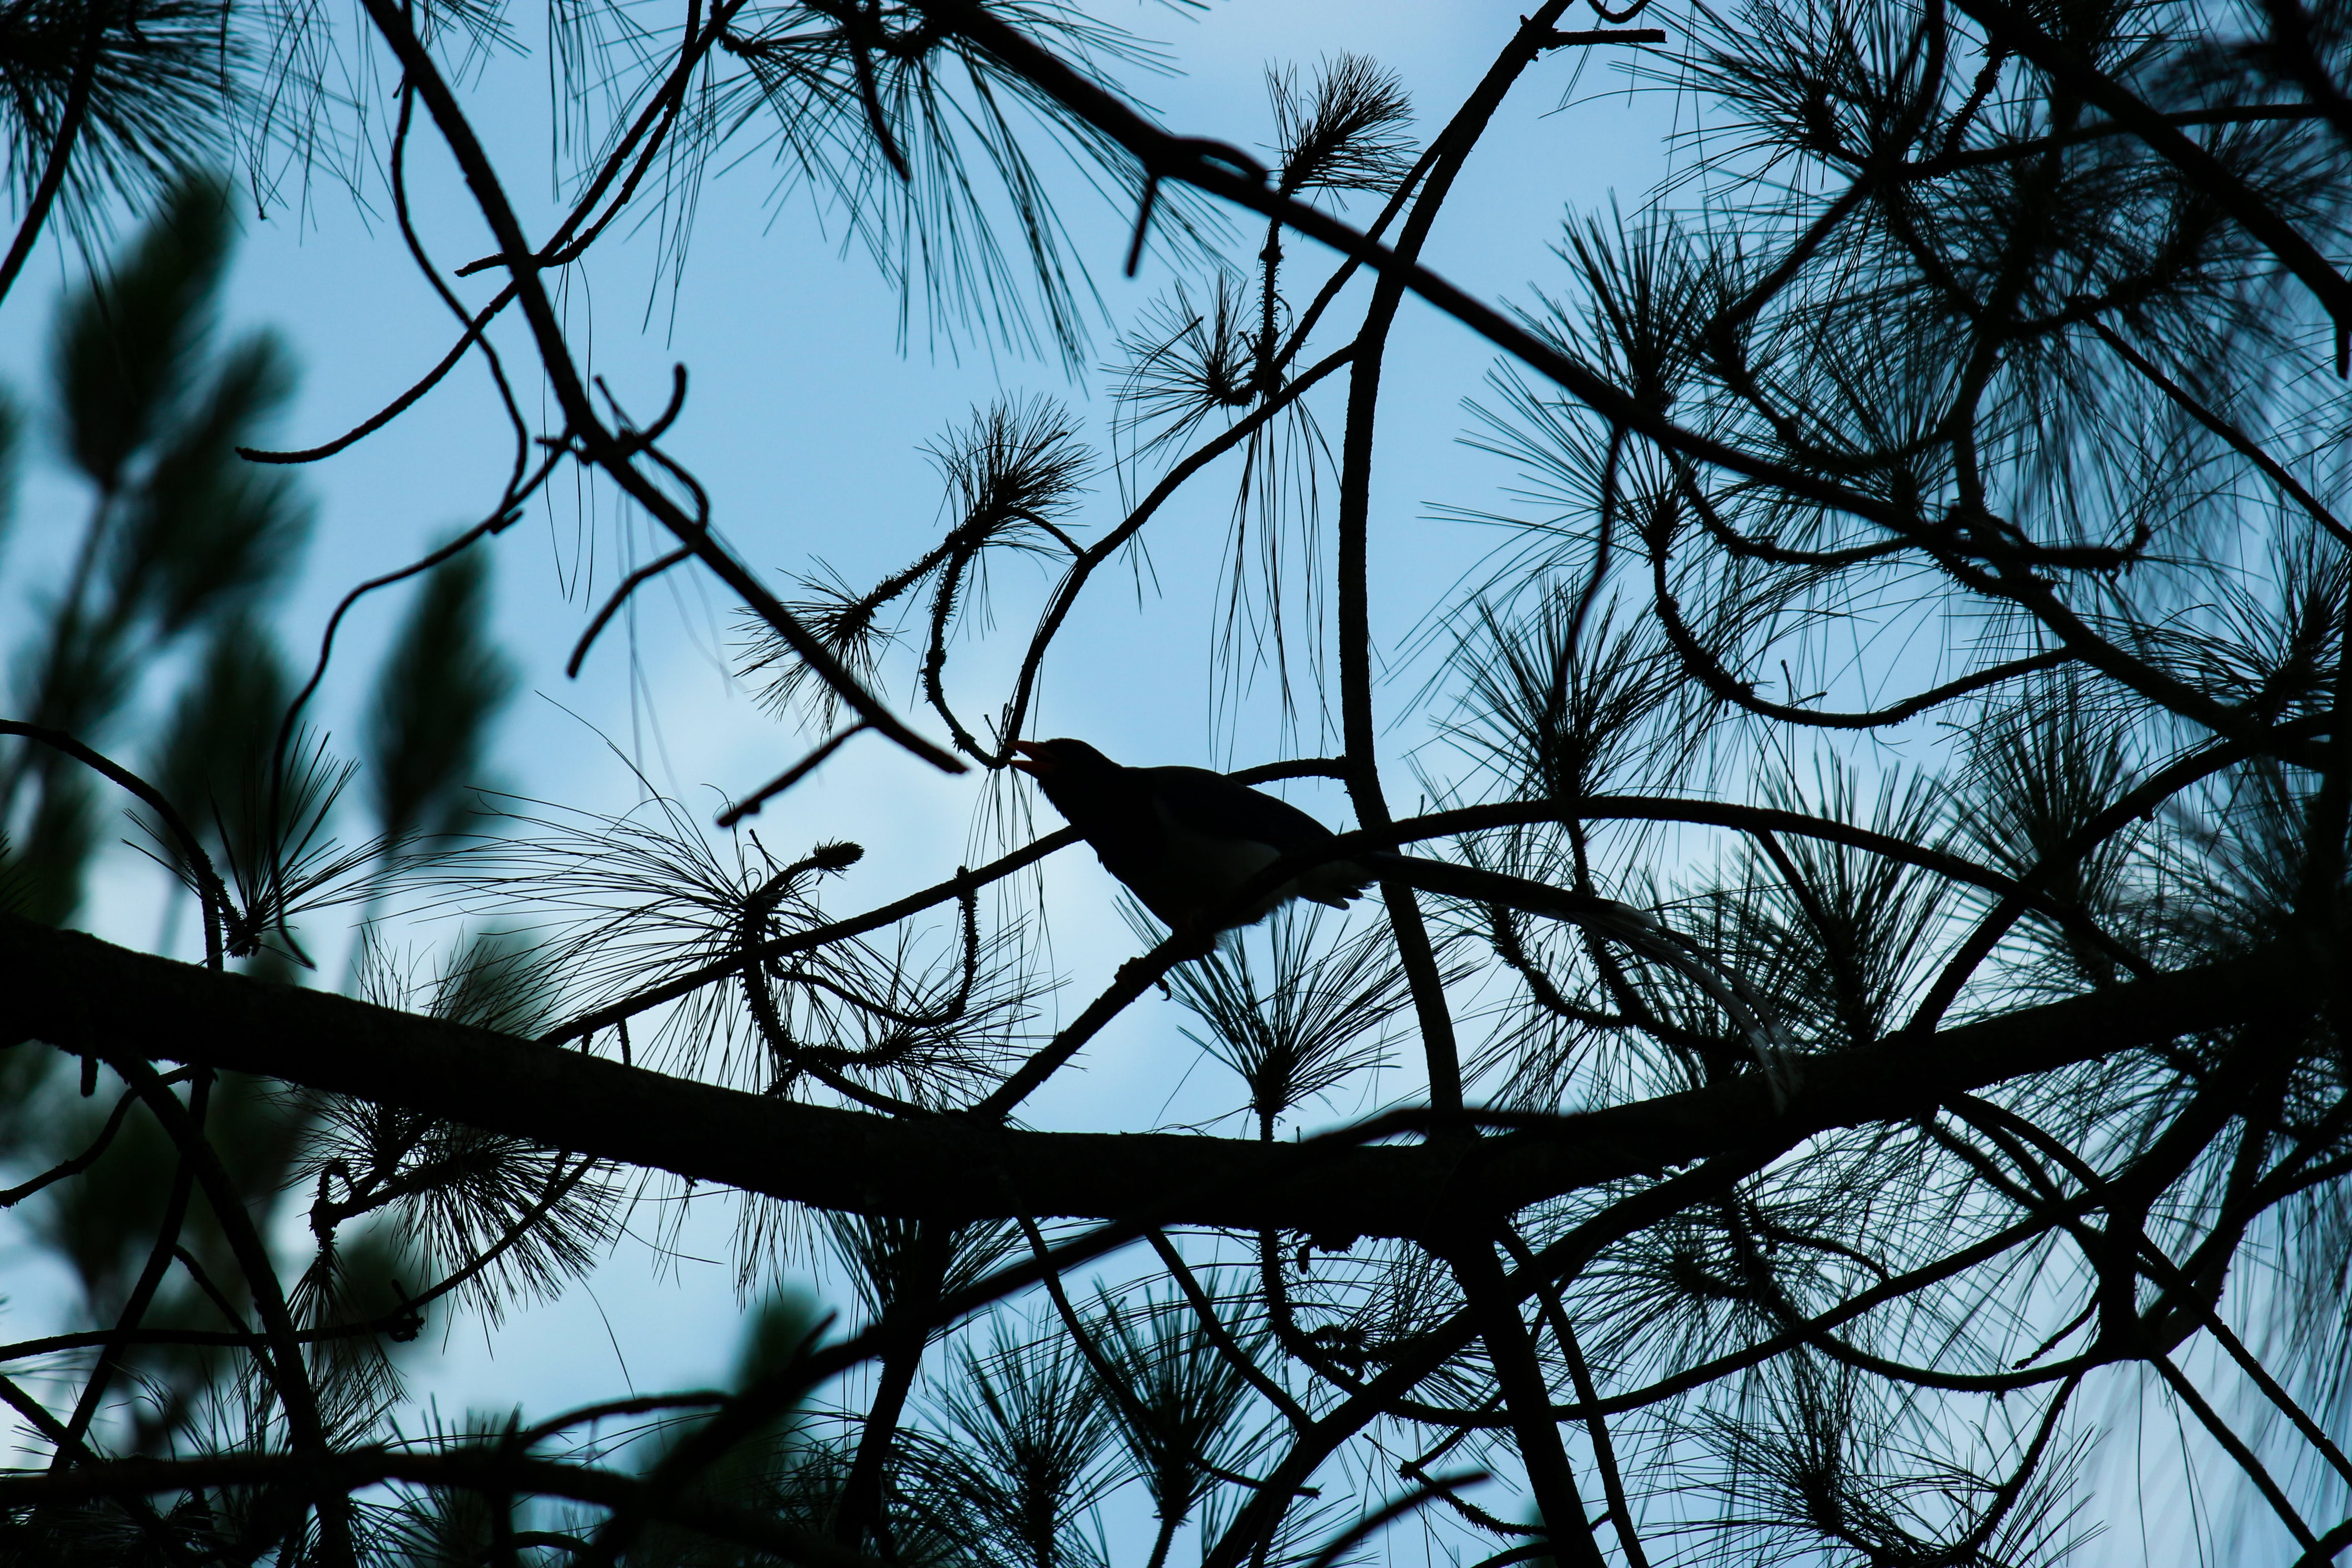 Foto d'estoc gratuïta de #birds #birdphotography #bird #nature #wildlife #b, #blues #bird #wildlife #trees #pine #nature